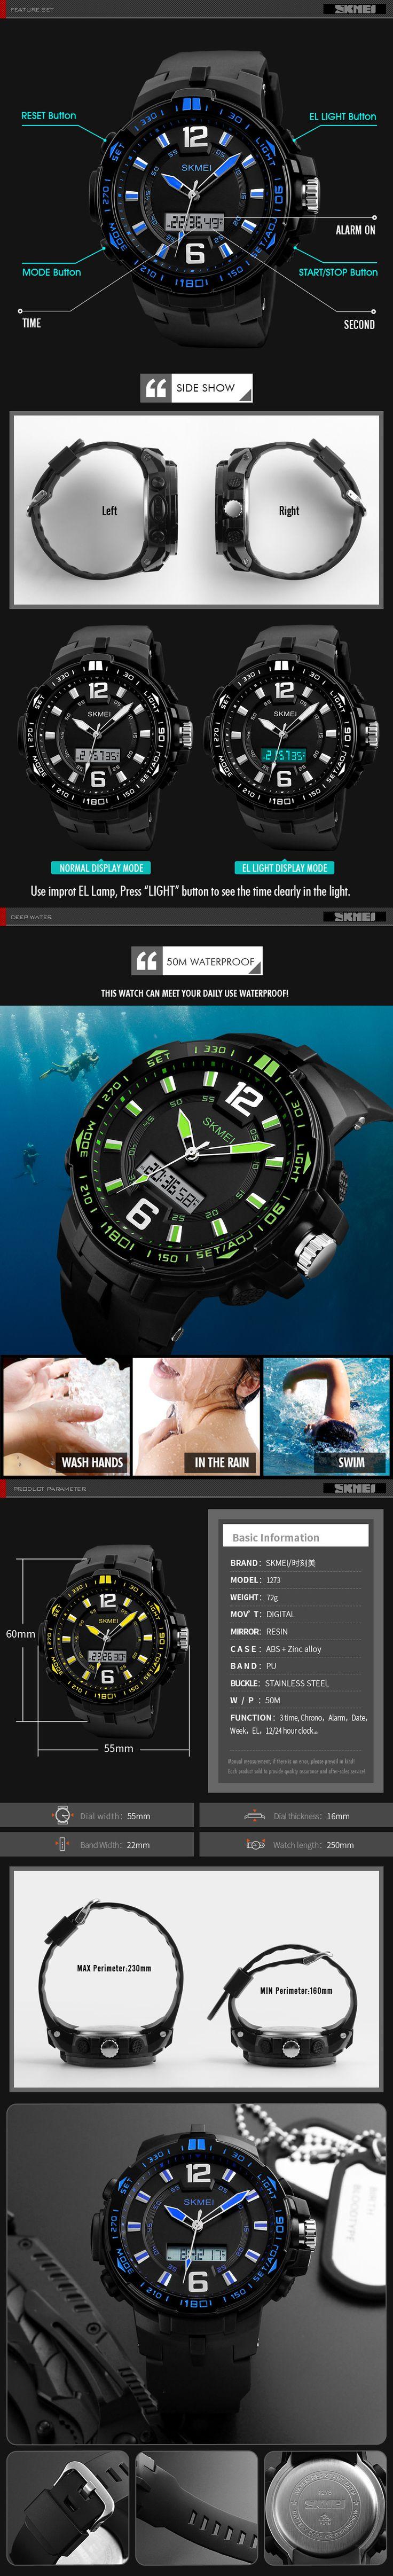 SKMEI 1273 Outdooors Men Digital Watch 50M Waterproof Multifunction Fashionable LED Wirstwatches